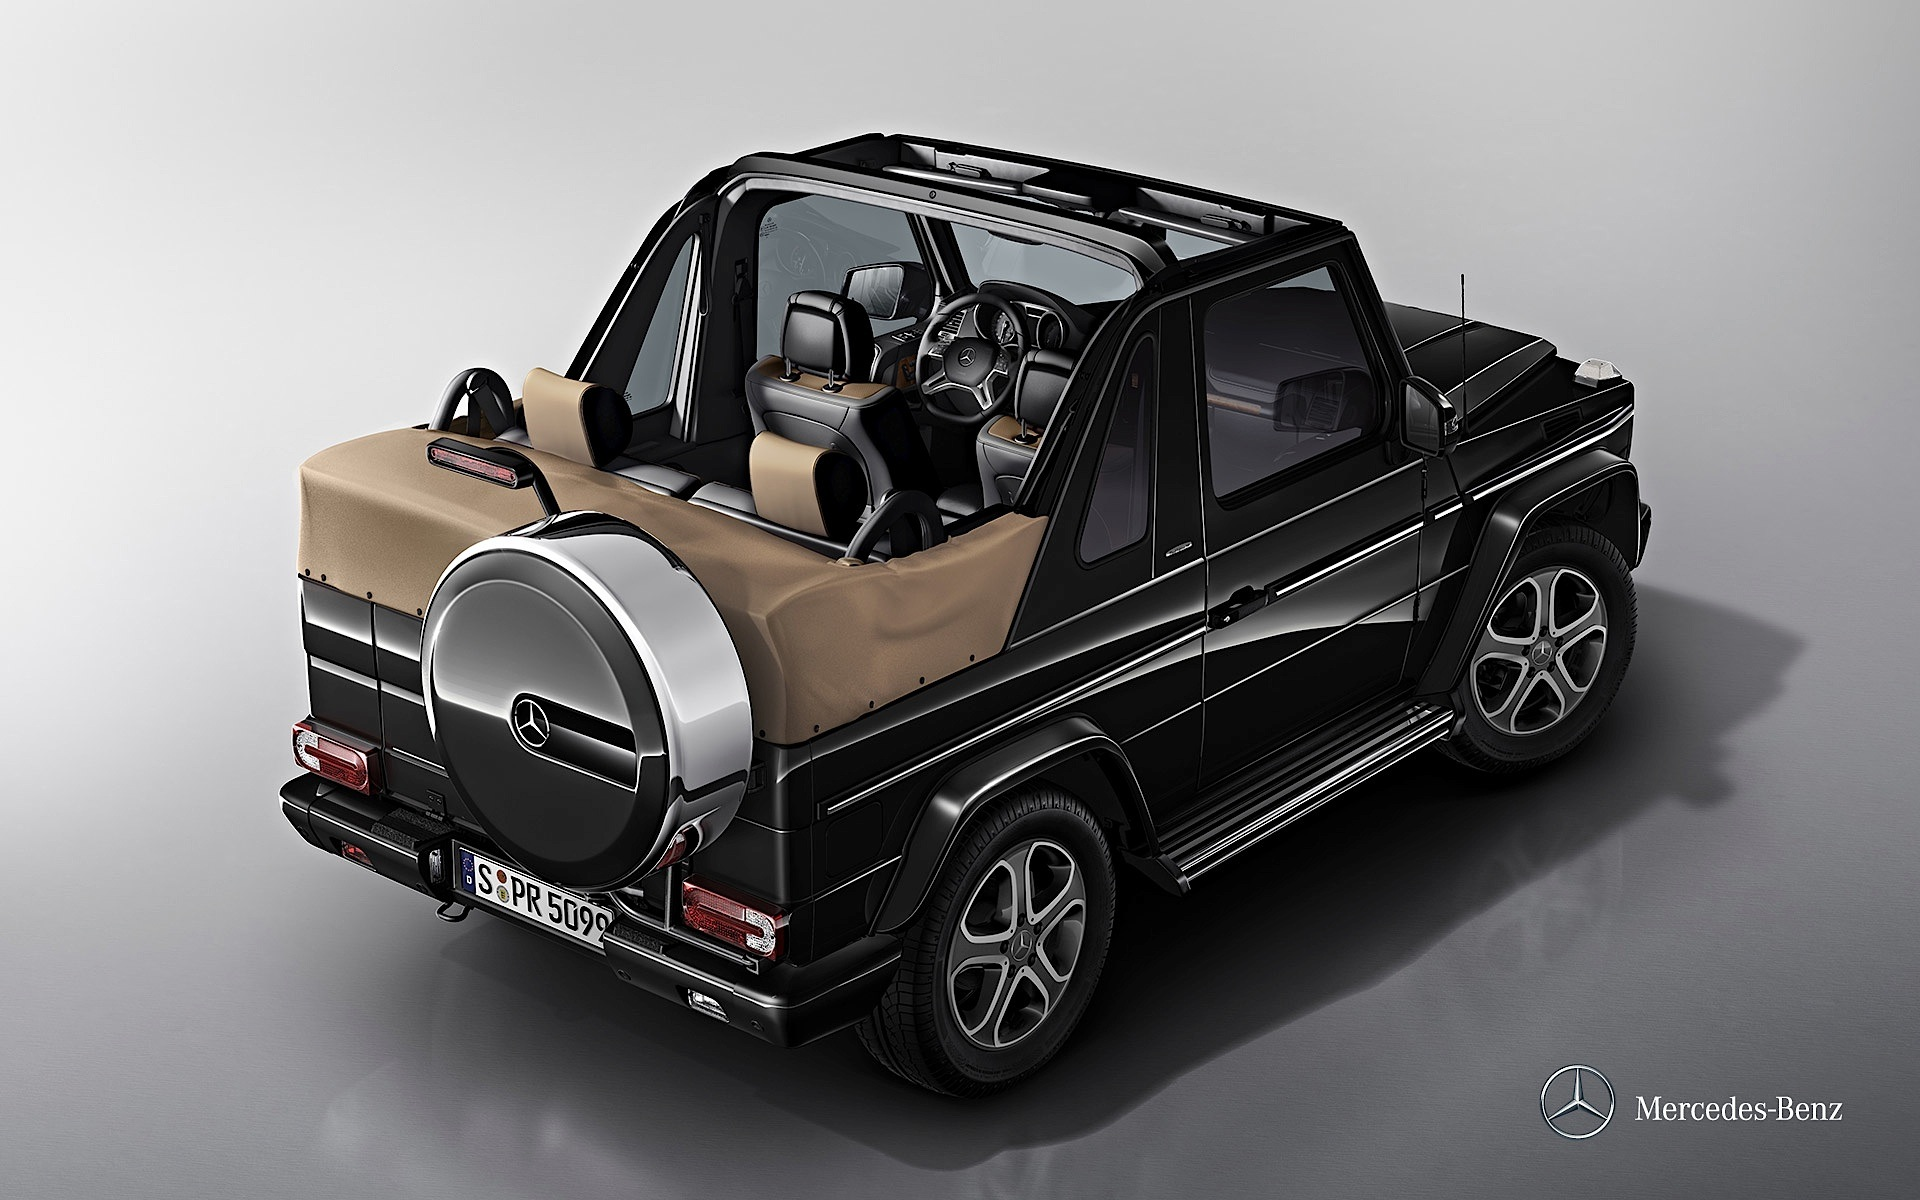 mercedes benz g klasse cabrio w463 2012 2013. Black Bedroom Furniture Sets. Home Design Ideas